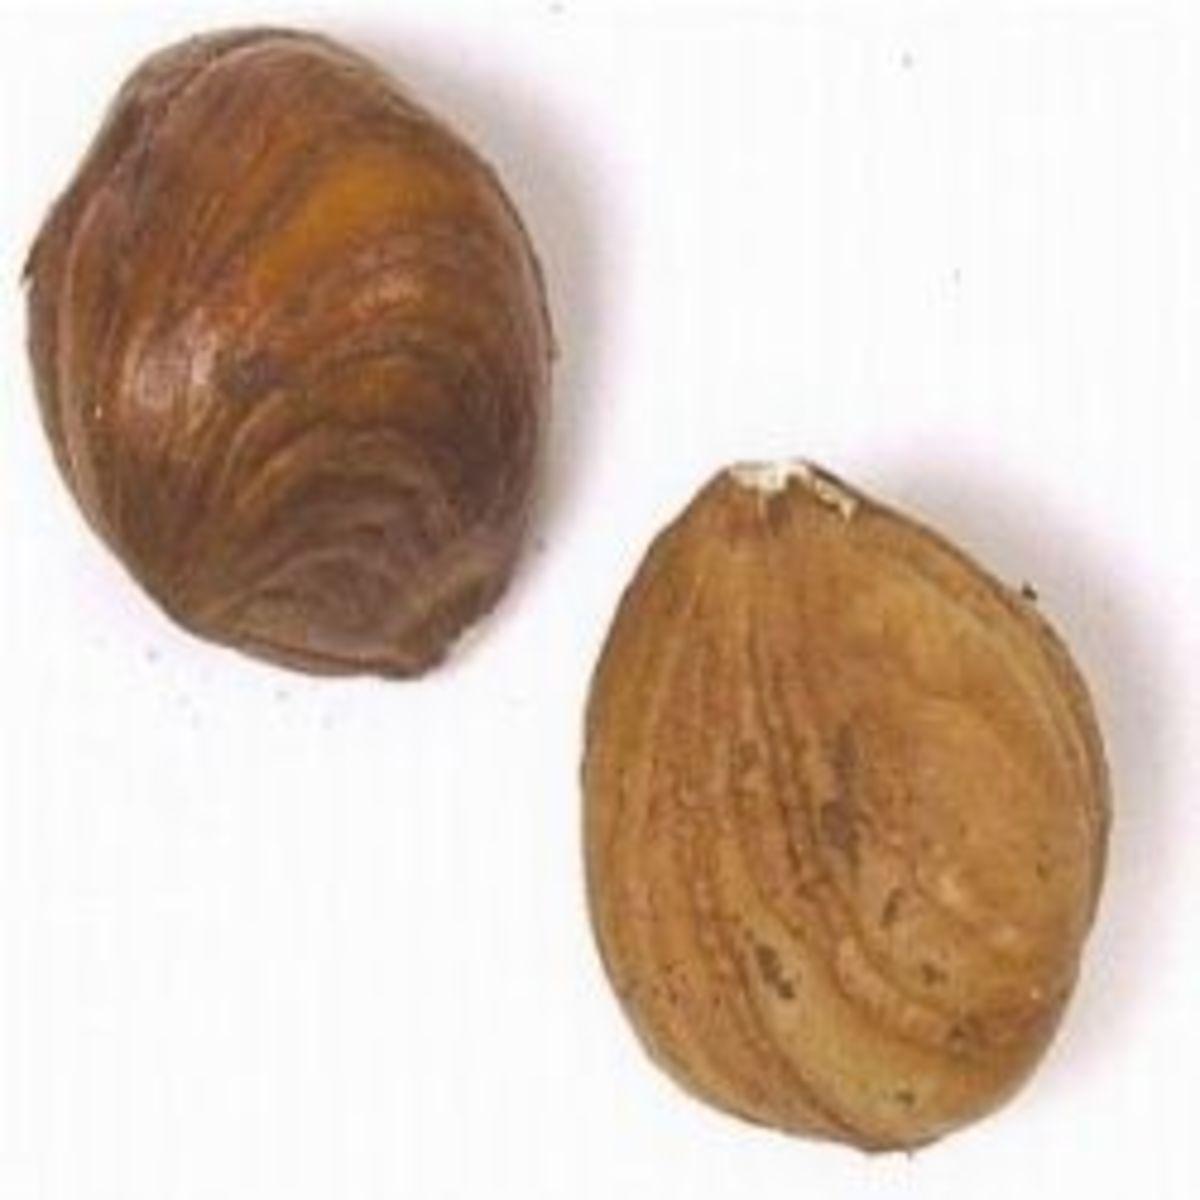 Hazelnuts or filberts